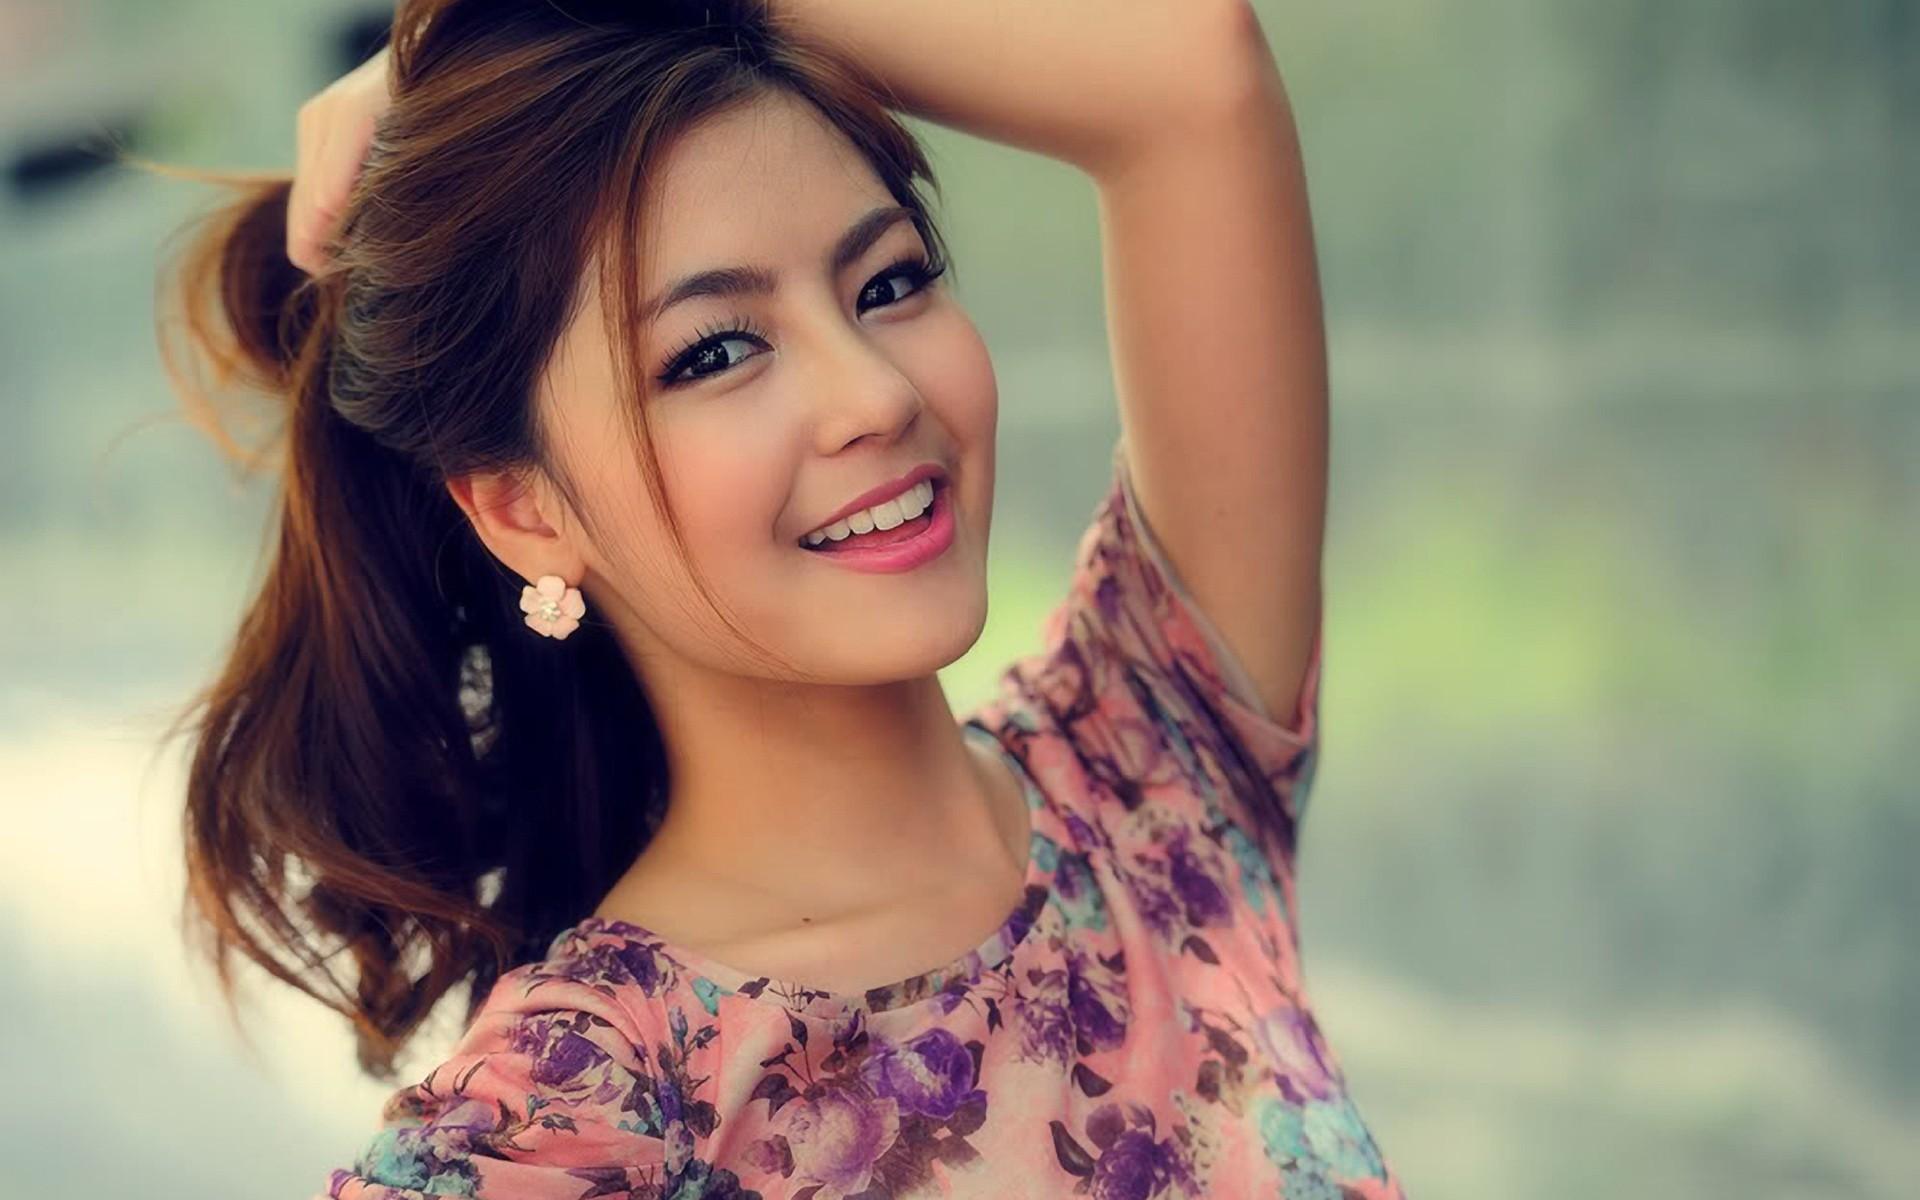 Фото девчонку японка фото 128-374